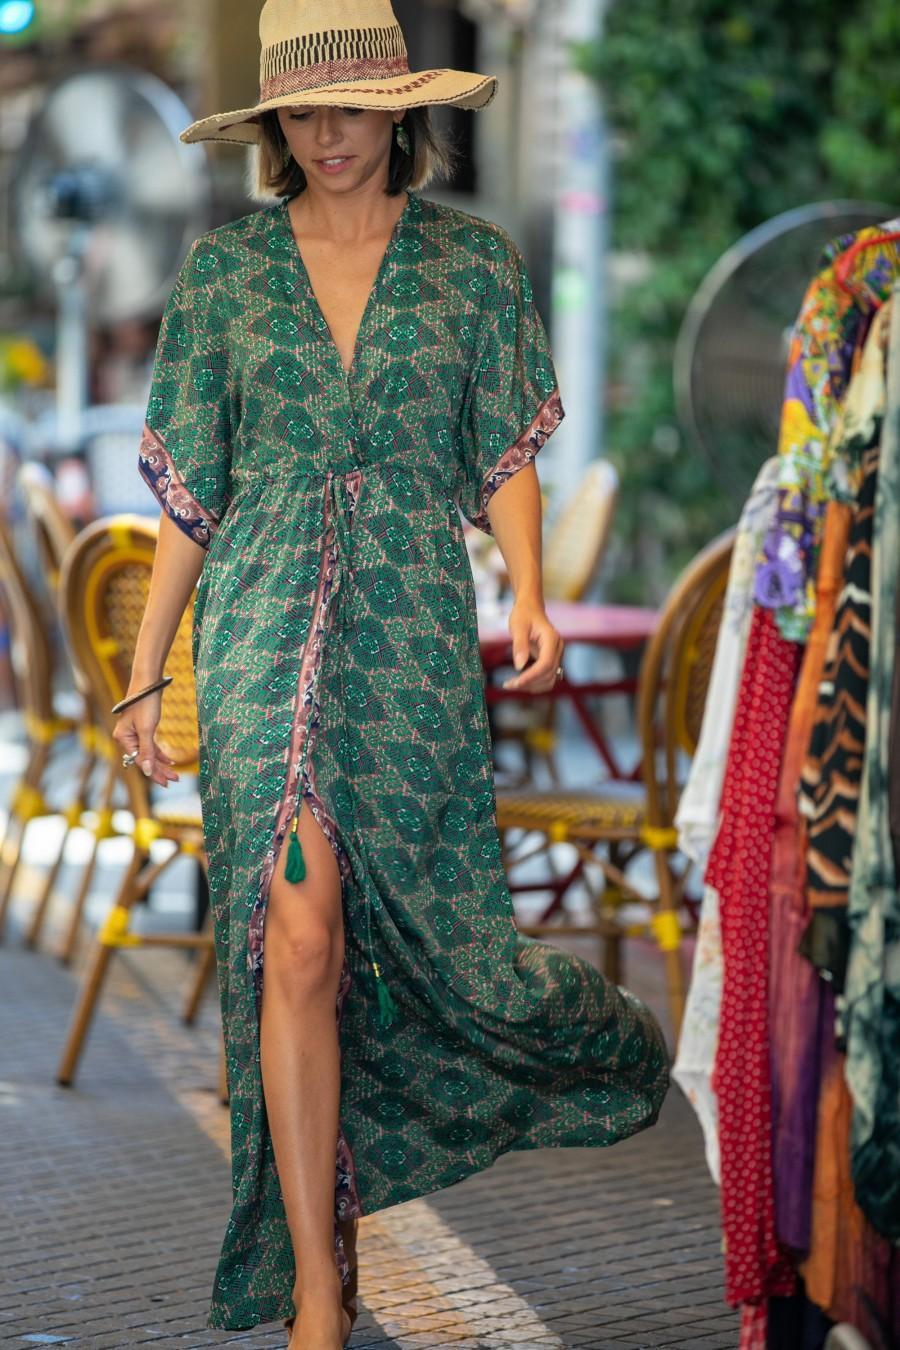 Wedding - Green Silky Kaftan Summer Dress, Women Resort Vacation Beach Dress, Long Ethnic Loose Hippie Wide Sleeves Dress